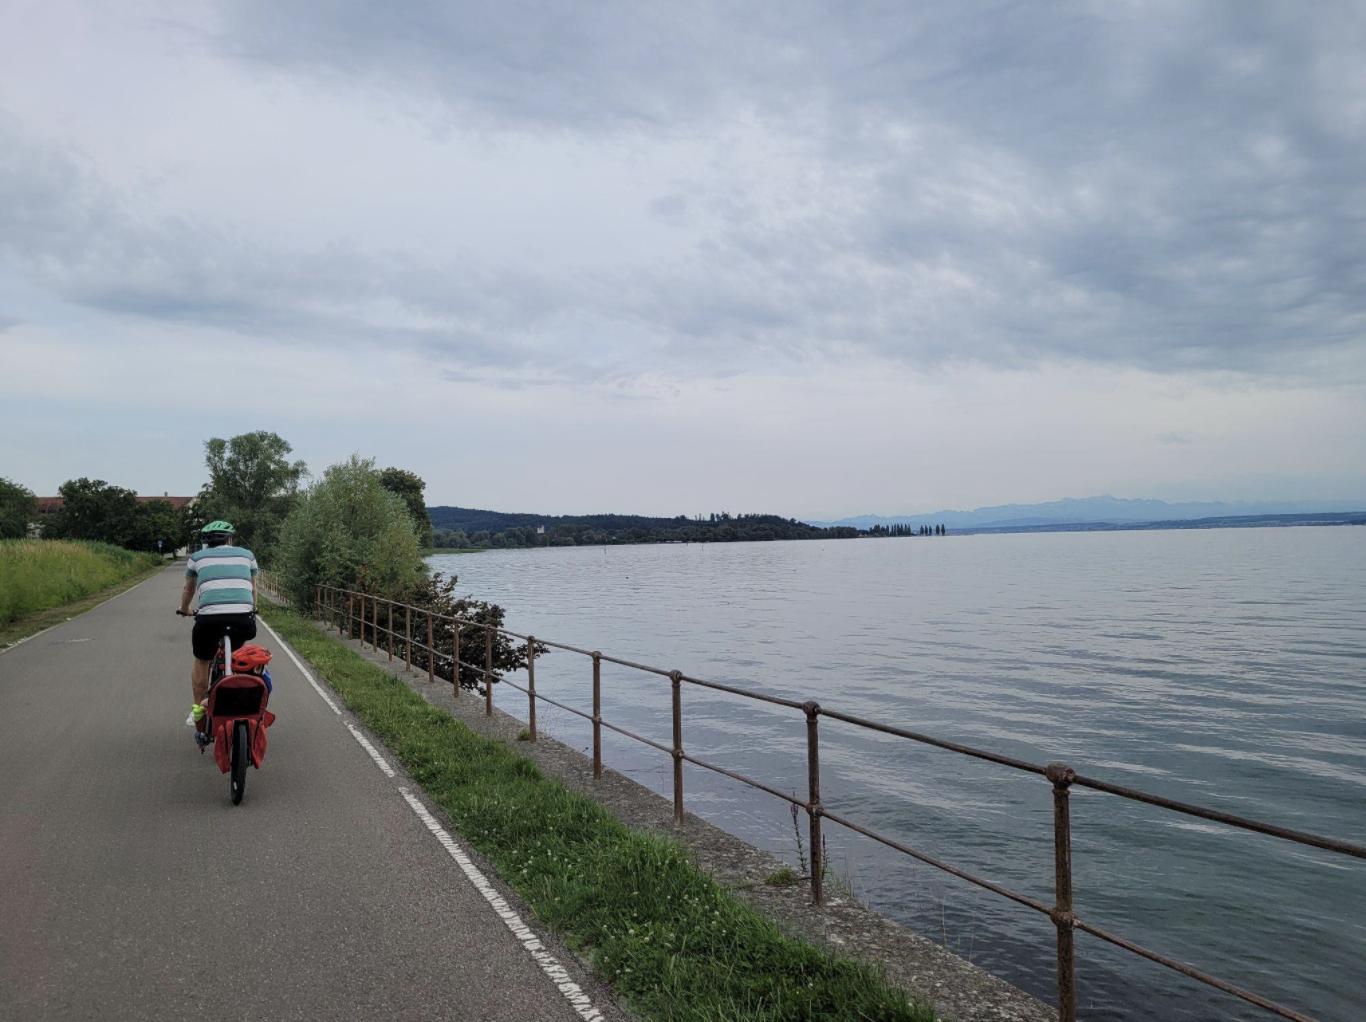 Bike riding on path Lake Constance